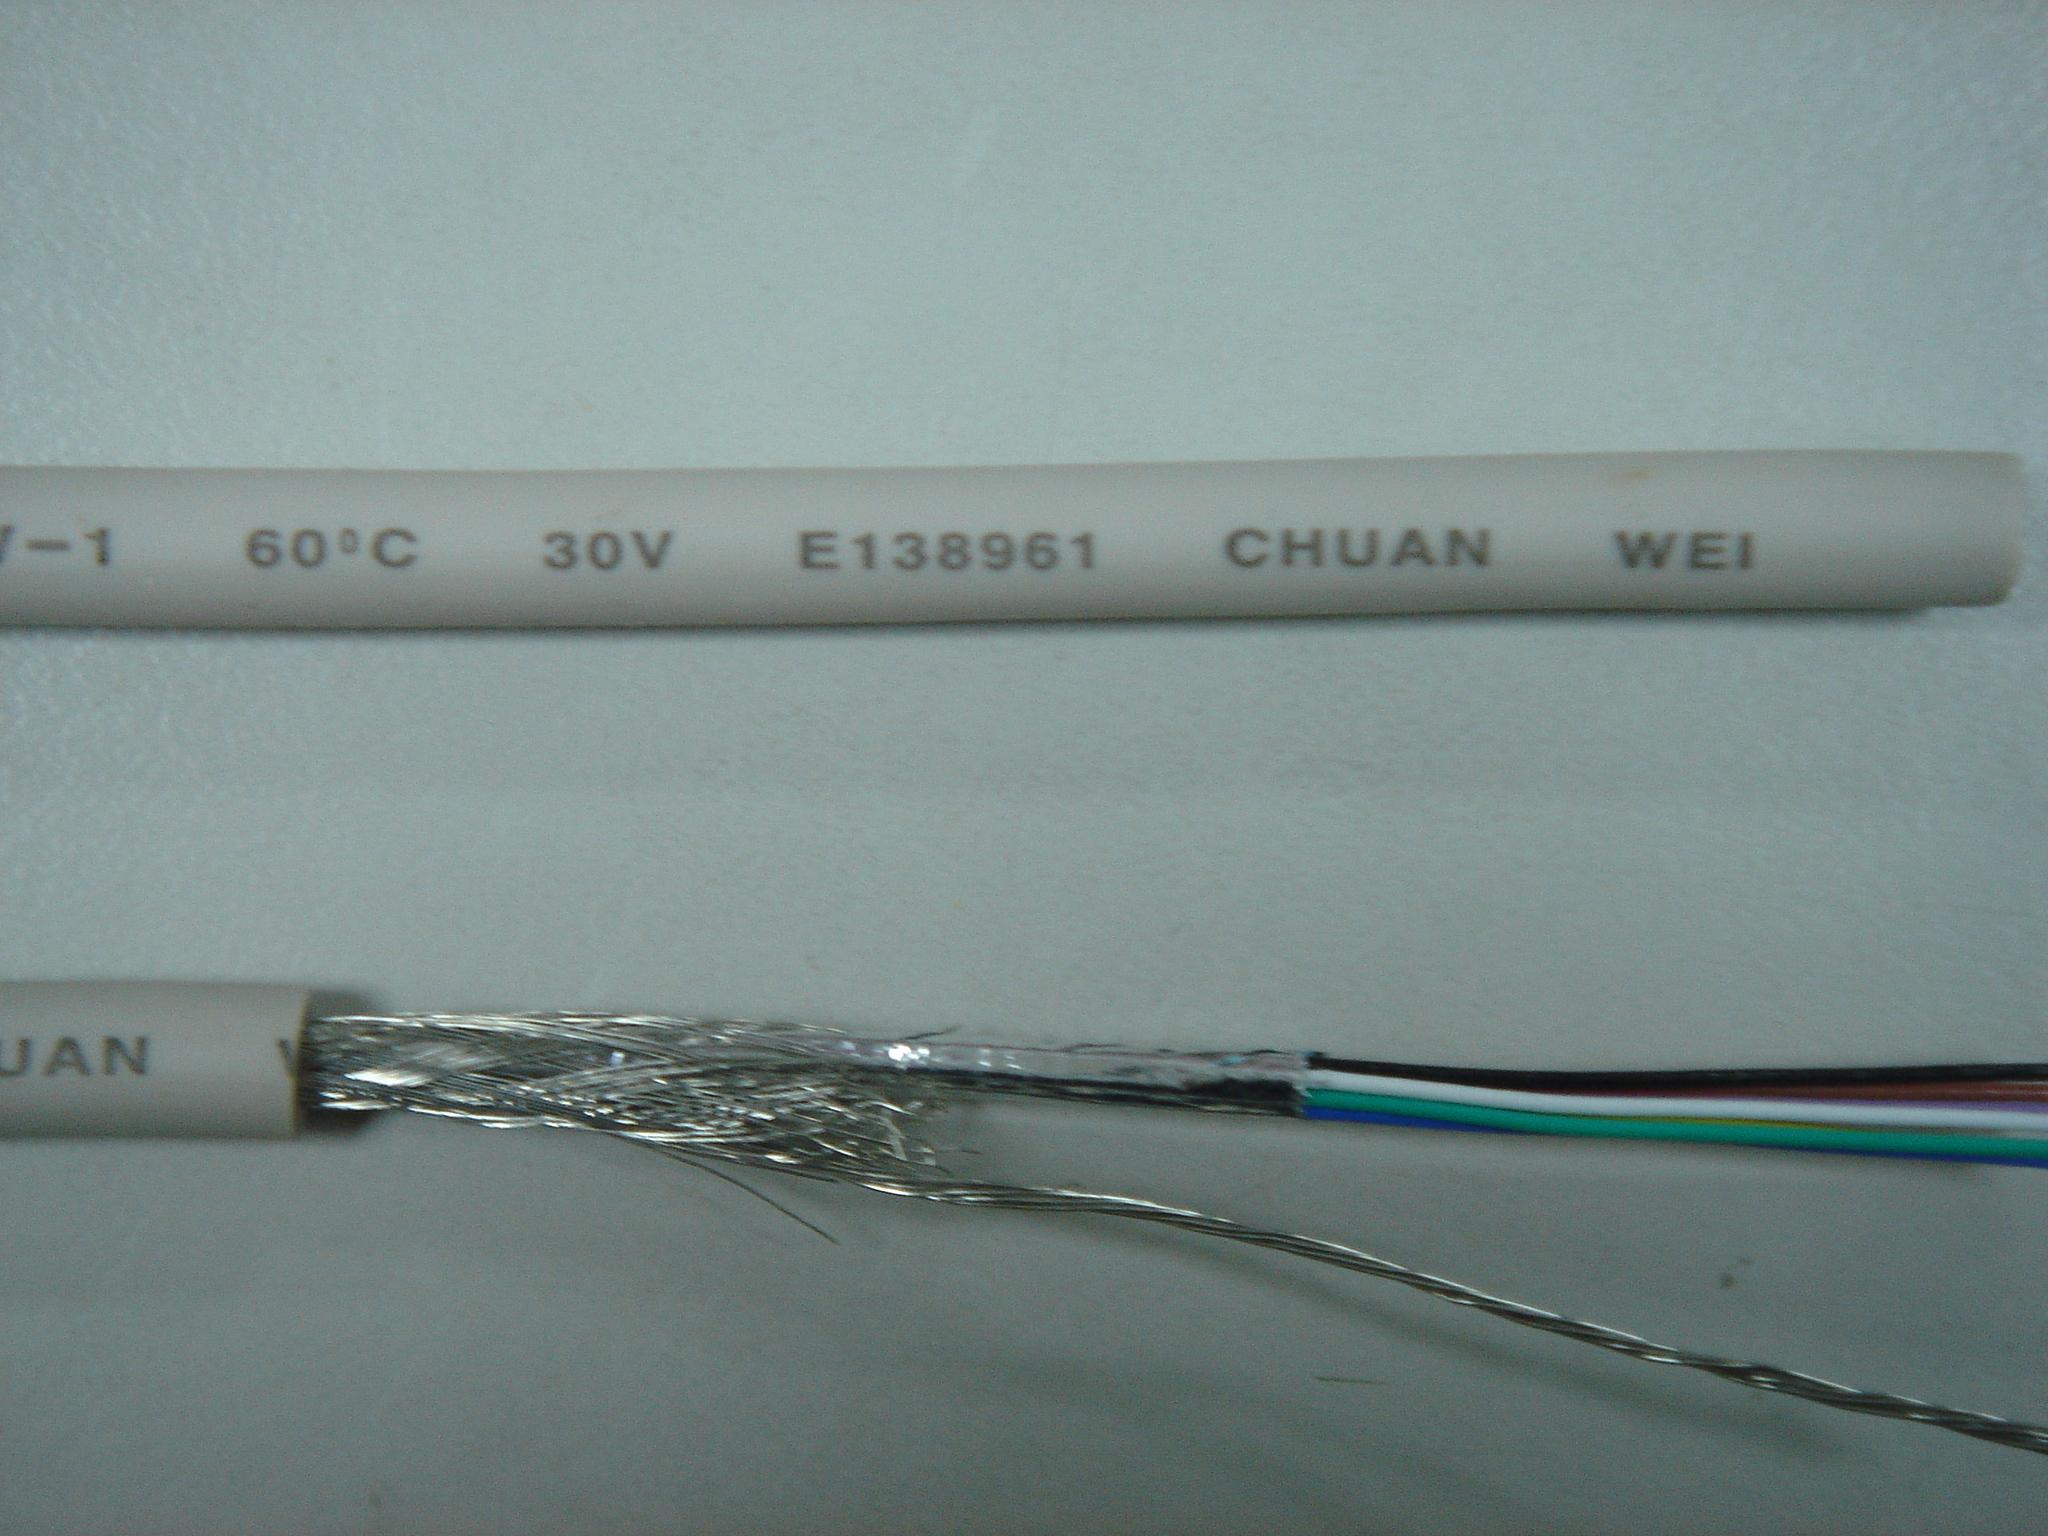 UL2969 Aluminum/mylar & Braid Shield - 產品介紹 - CHUAN WEI